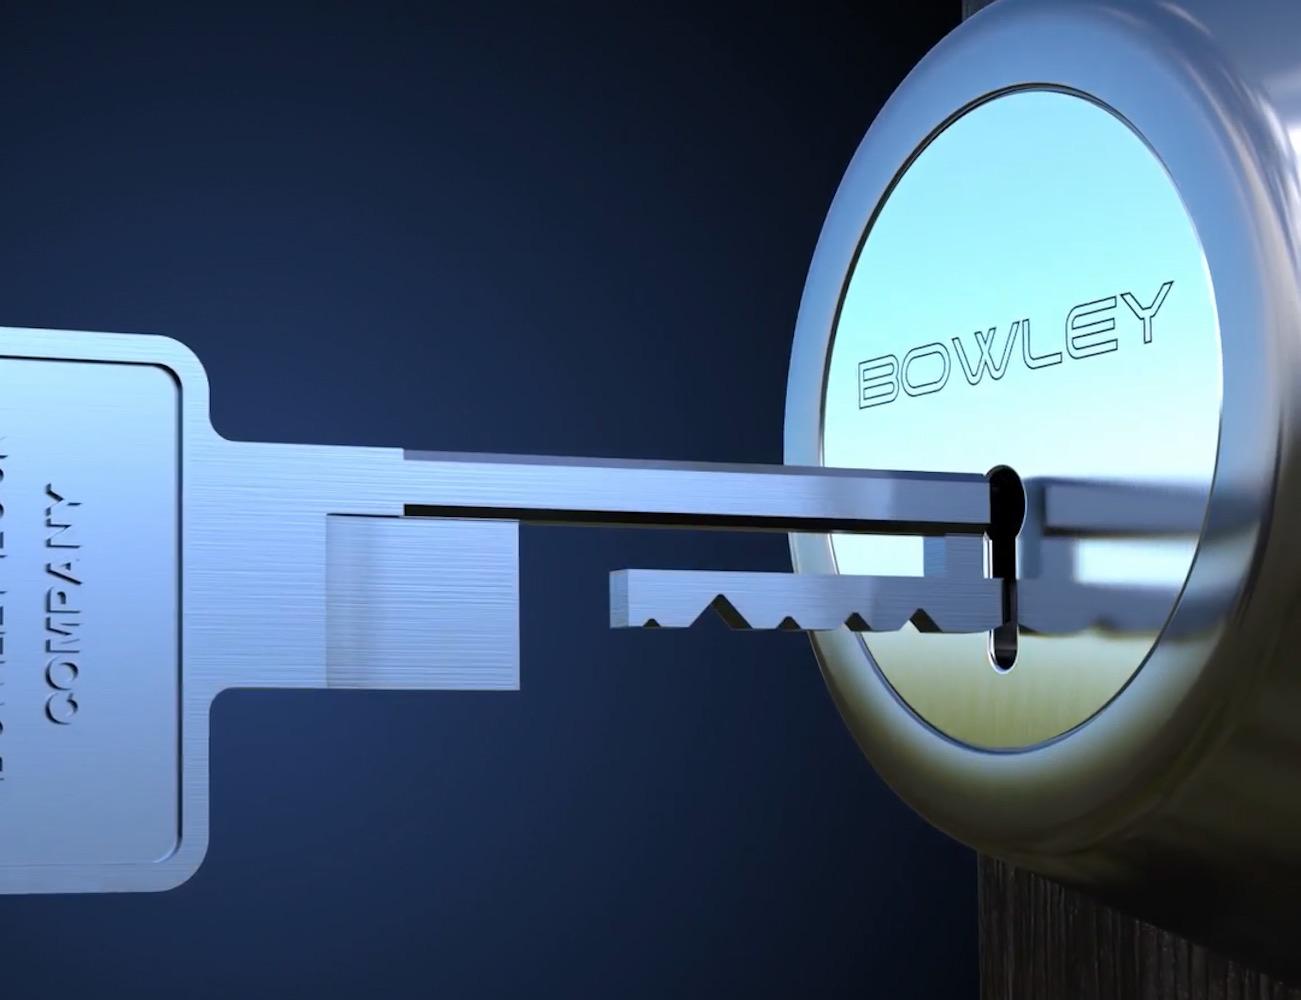 The Bowley Lock